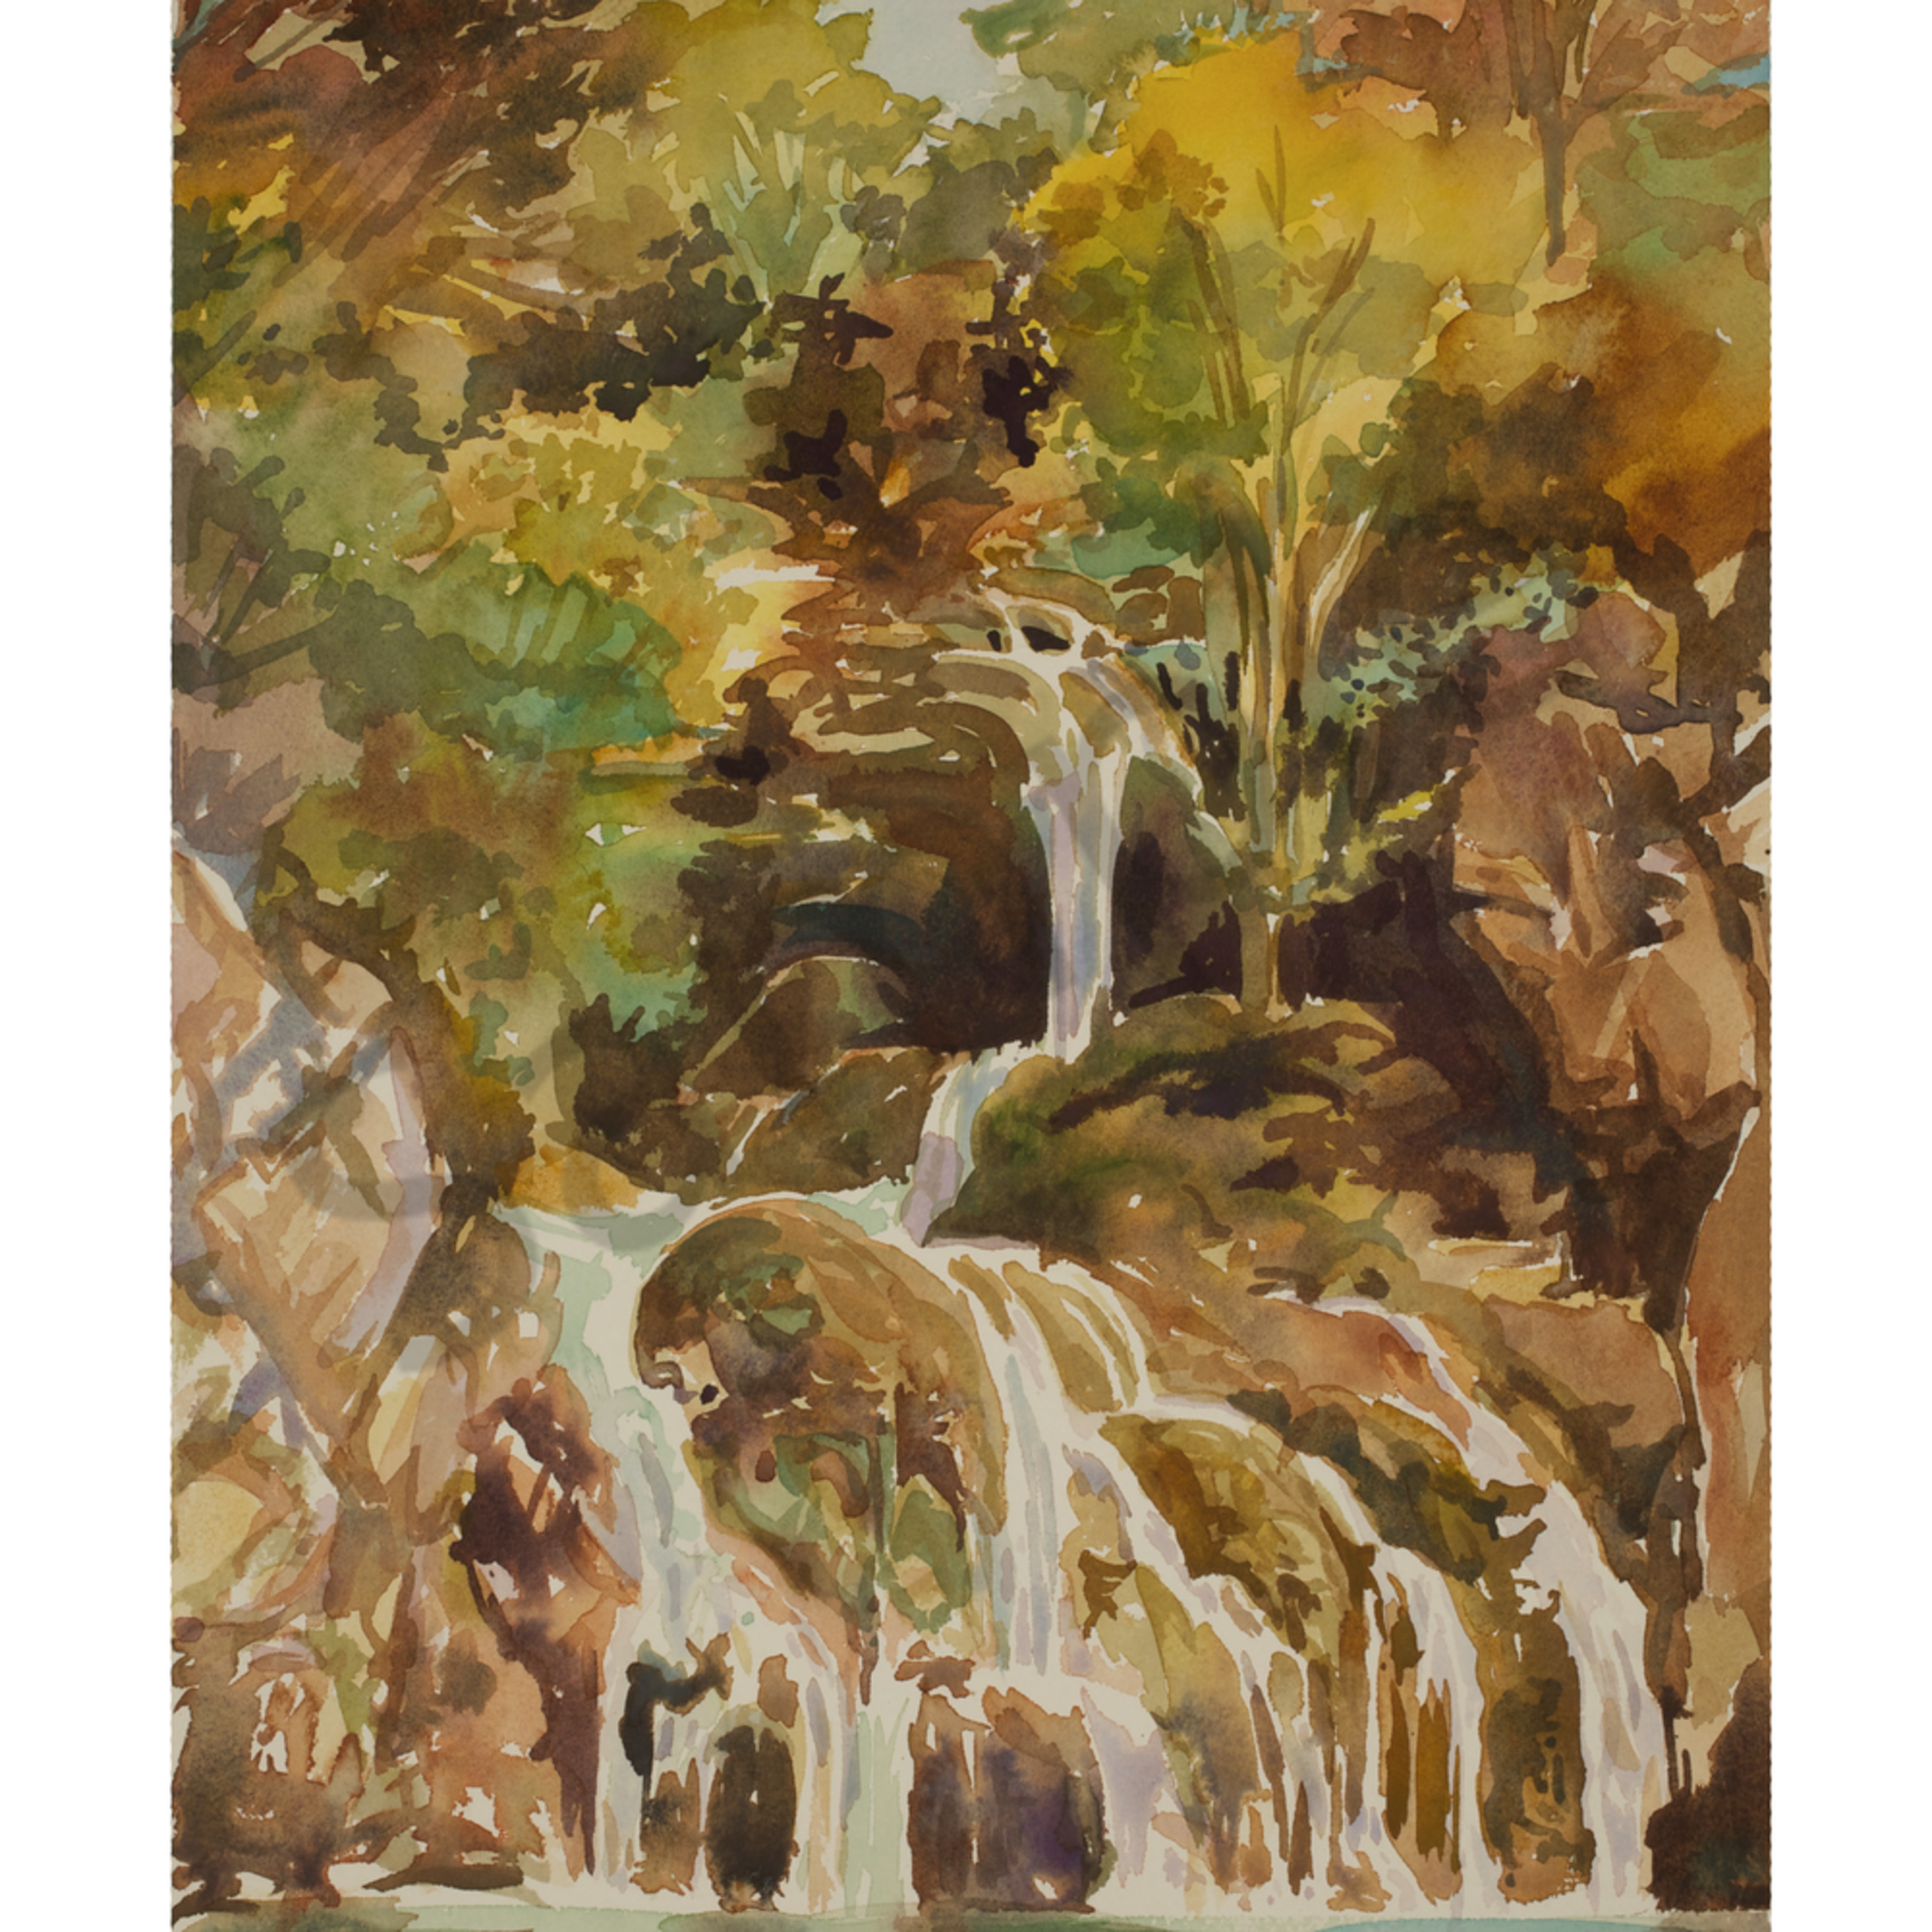 Falls of gorge du verdon france 14x20 cp wc sb2h8i